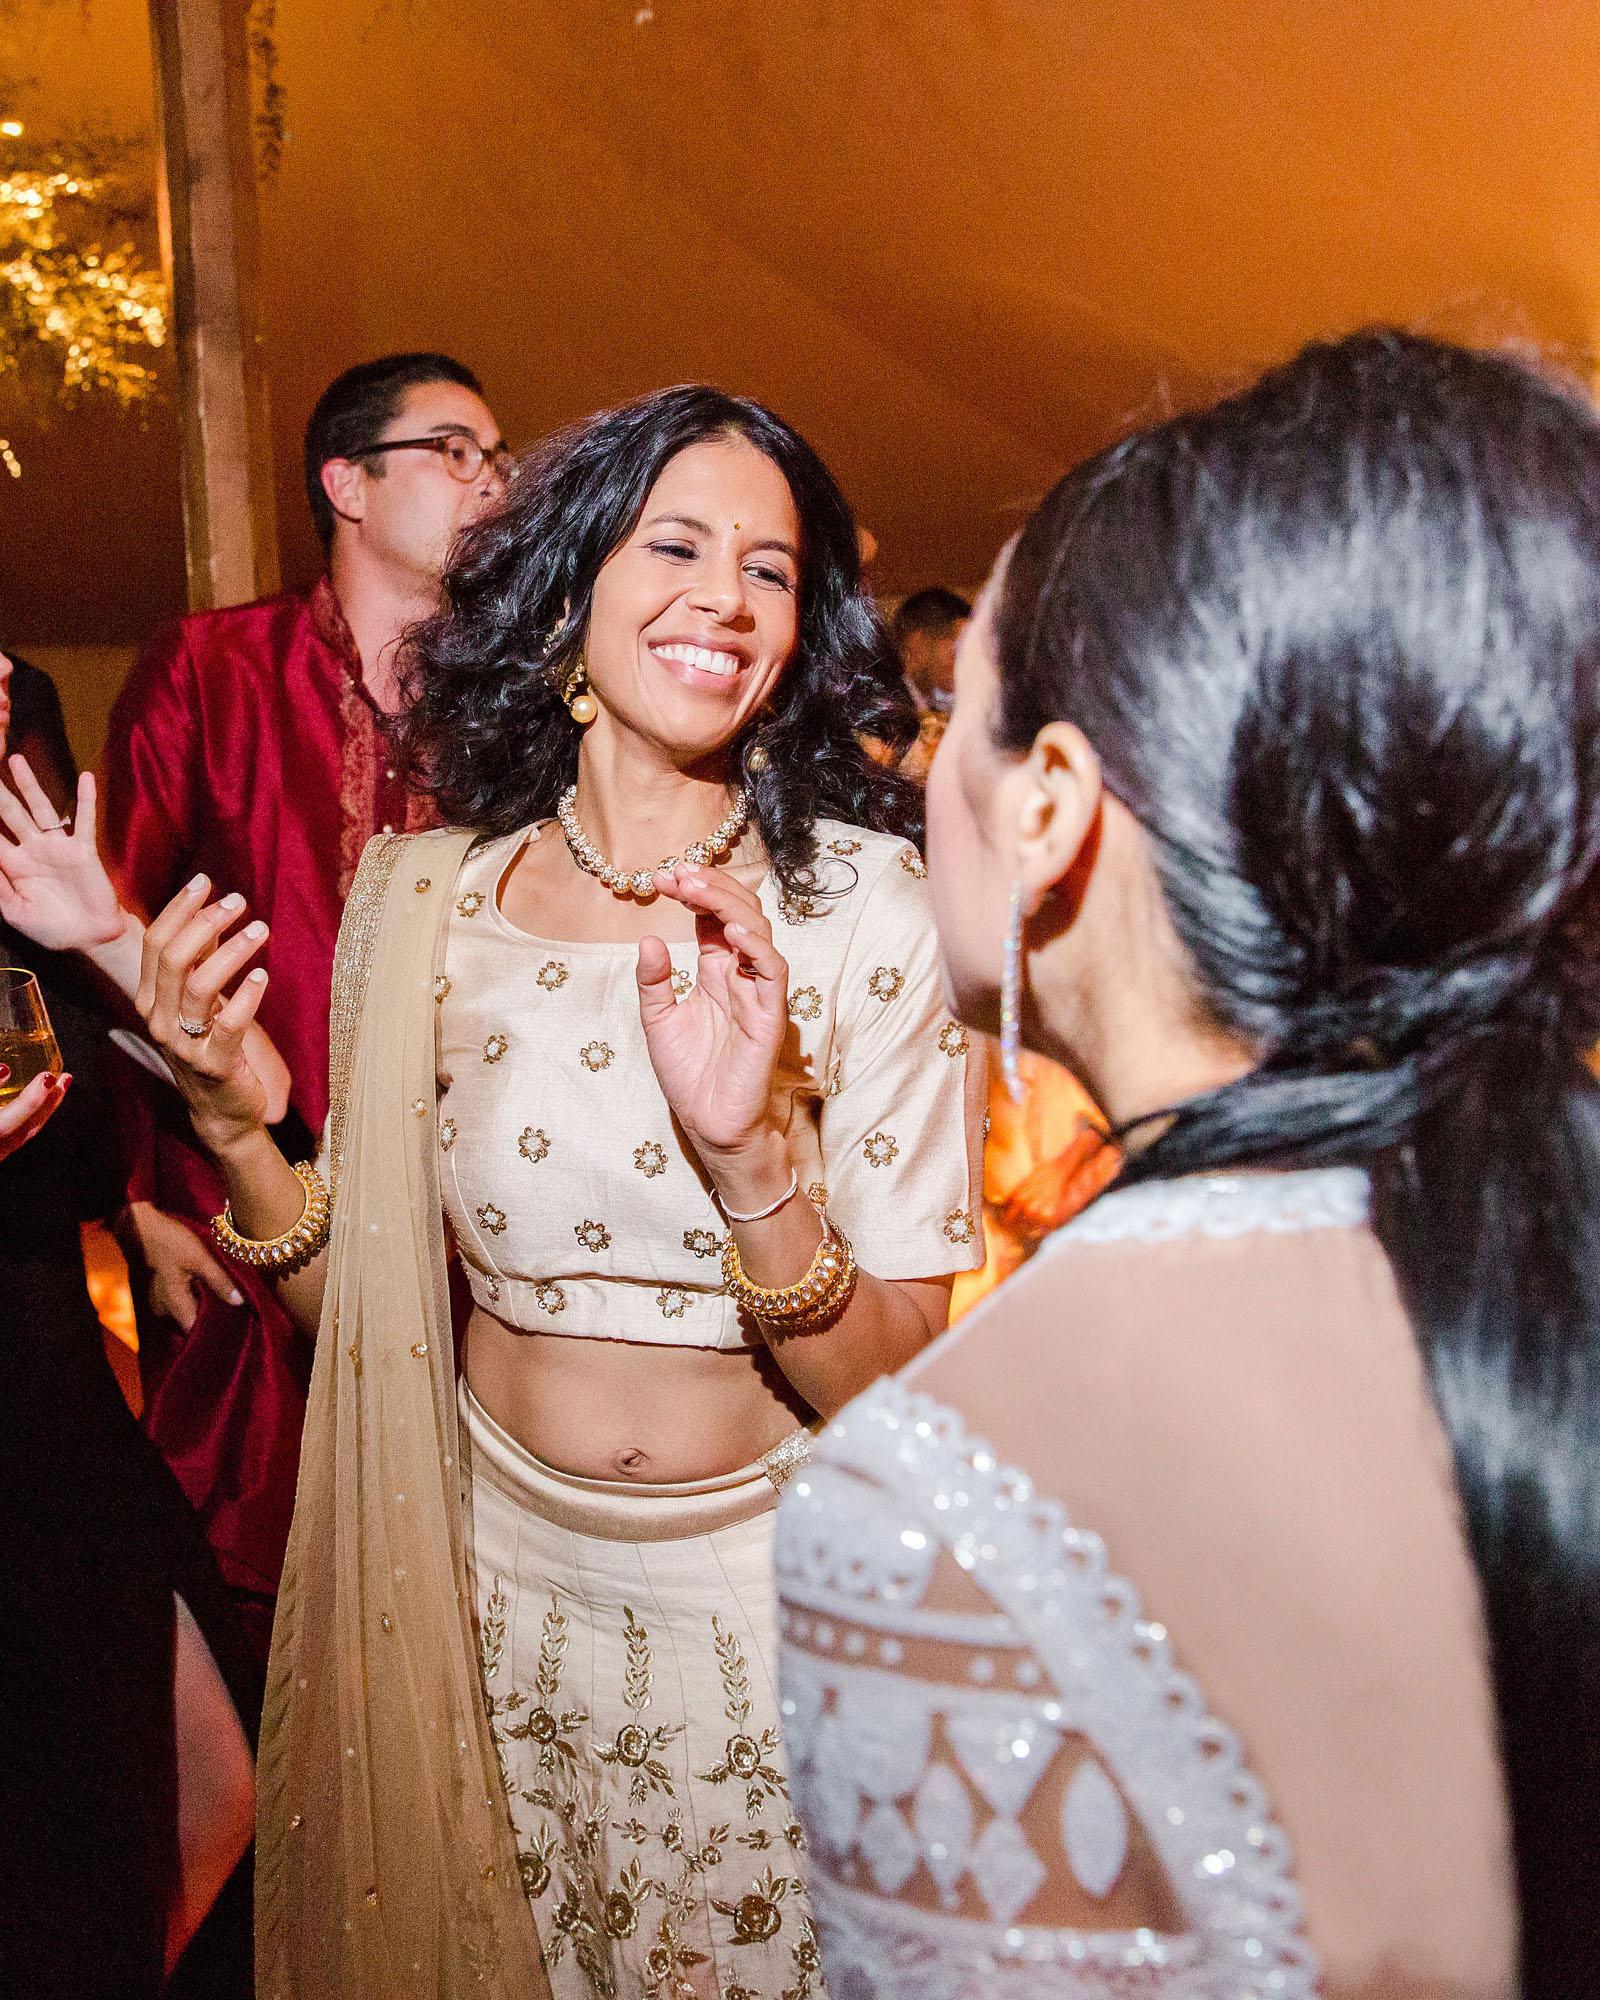 jenna alok wedding wine country california guests dance floor